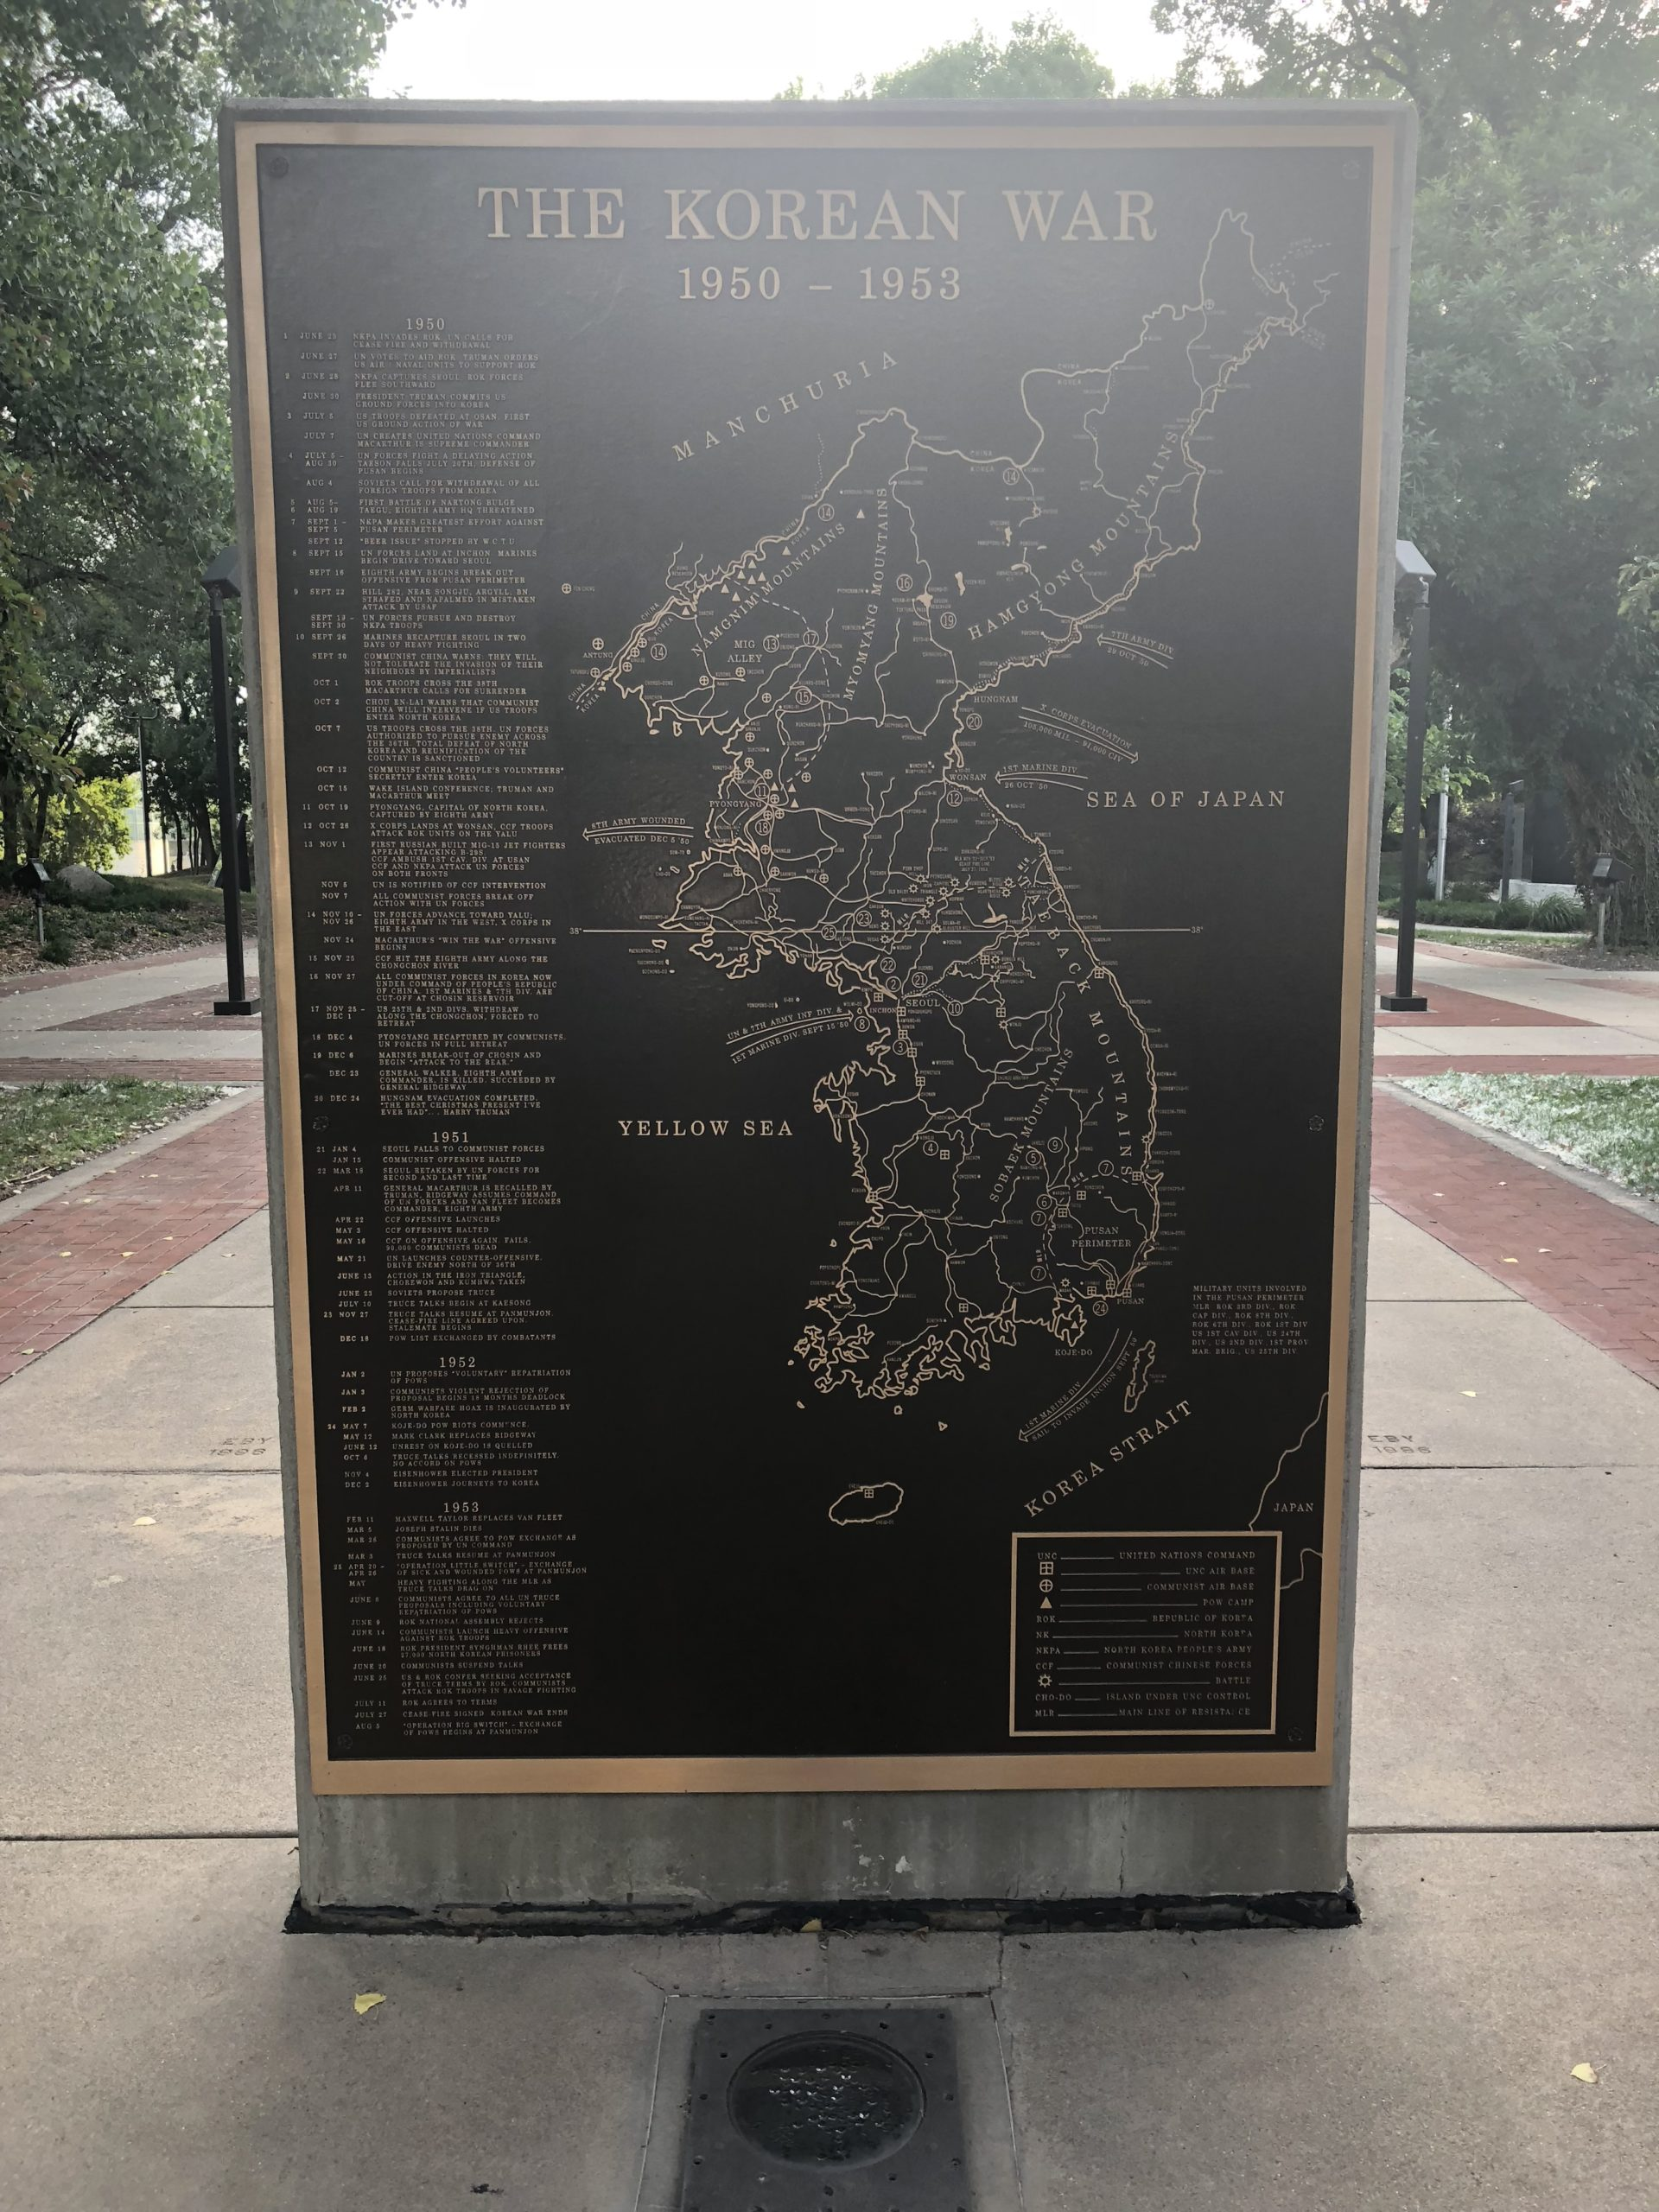 KS - United States